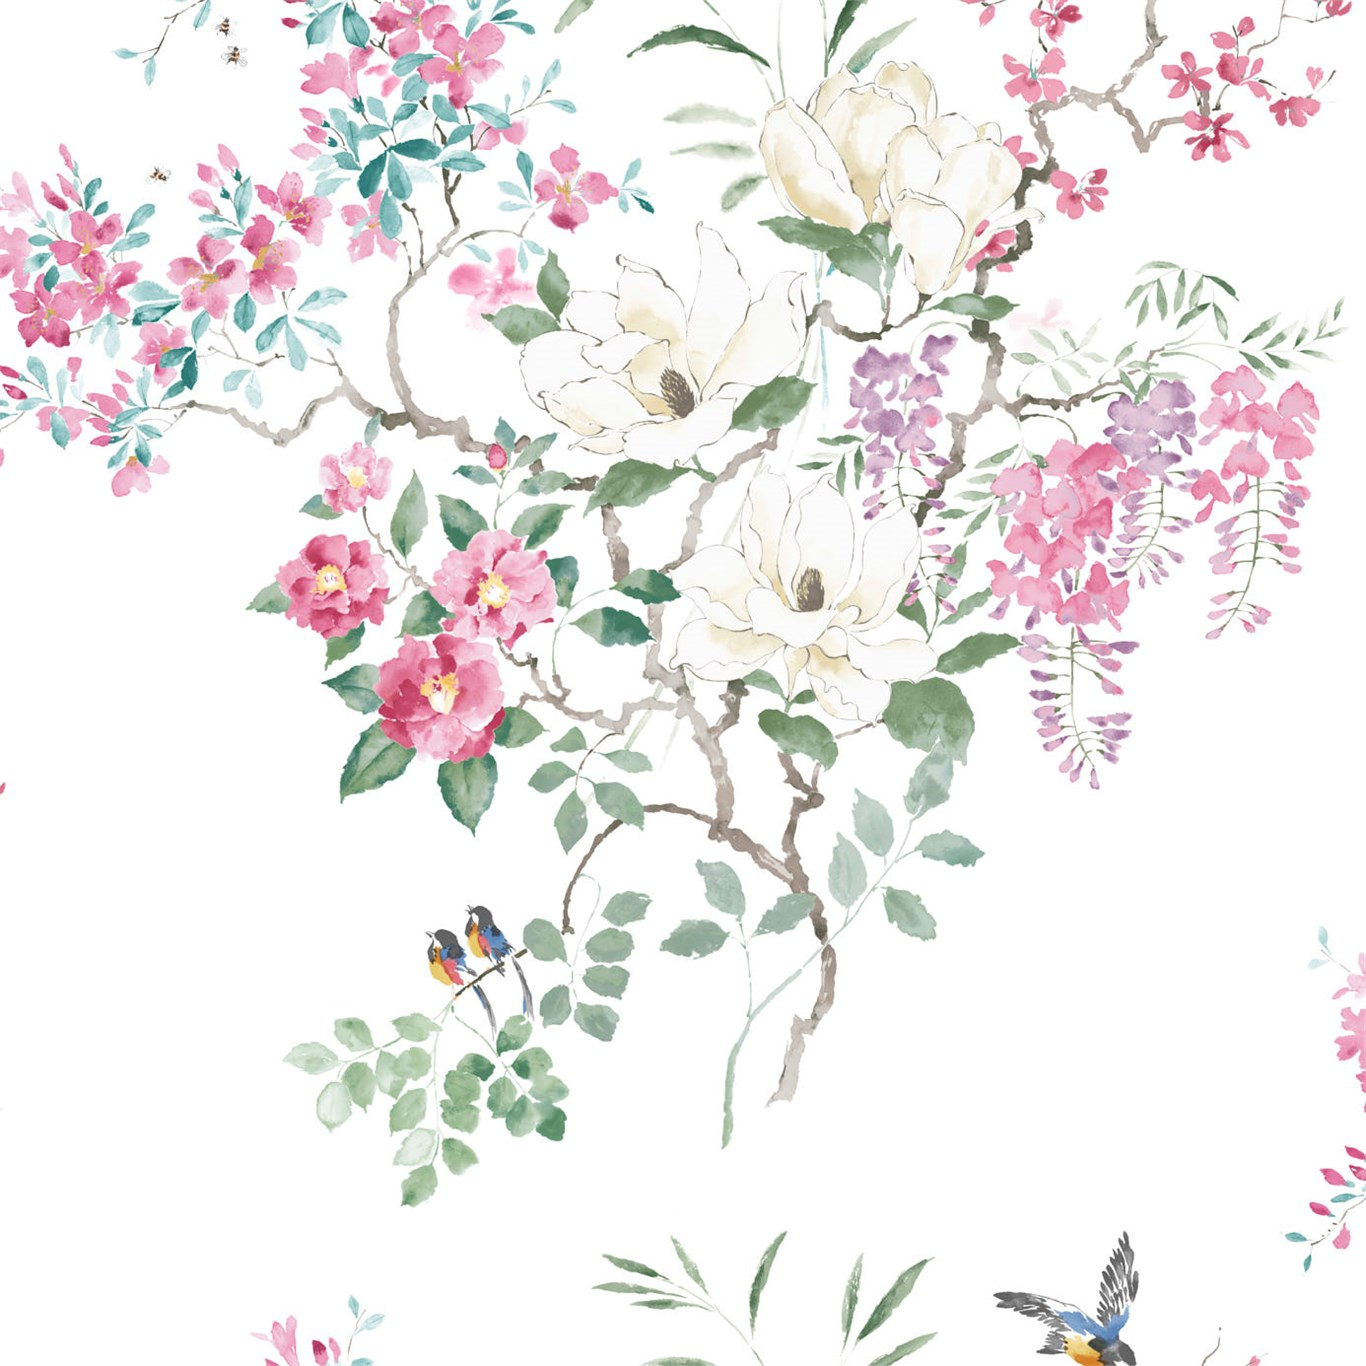 Magnolia & Blossom Panel A + B